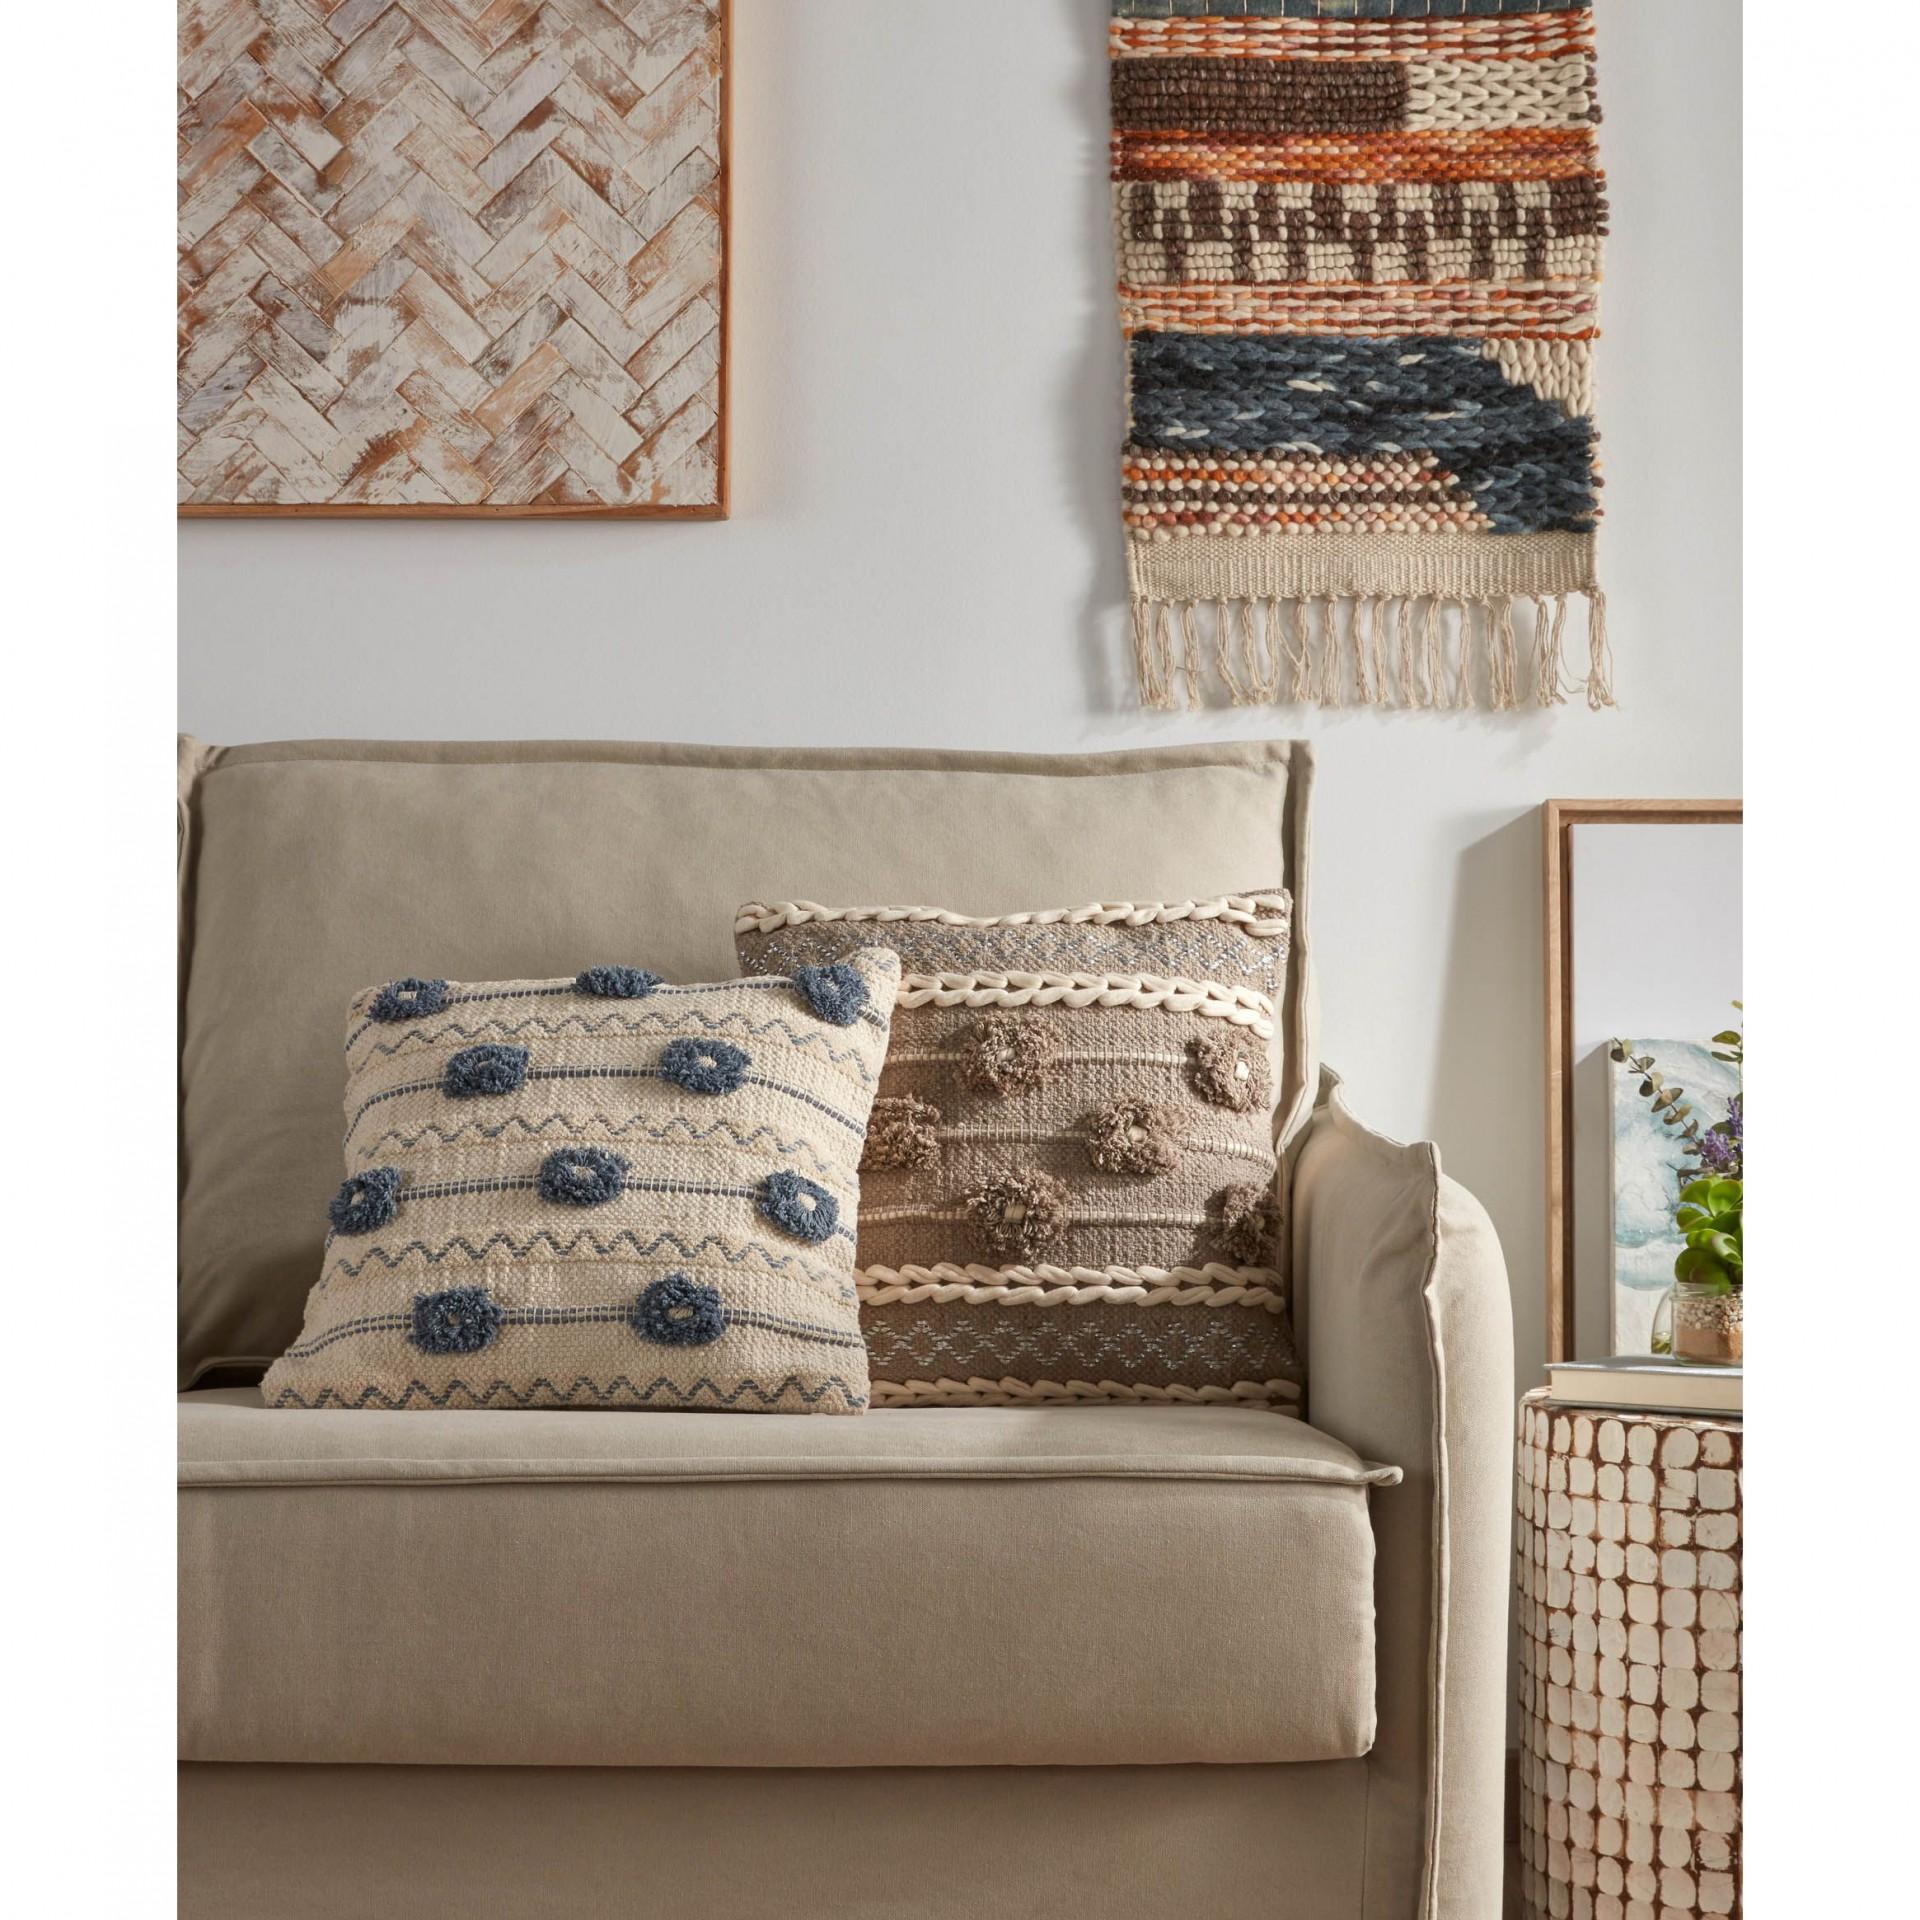 Capa de almofada Leand, marron/branco, 45x45